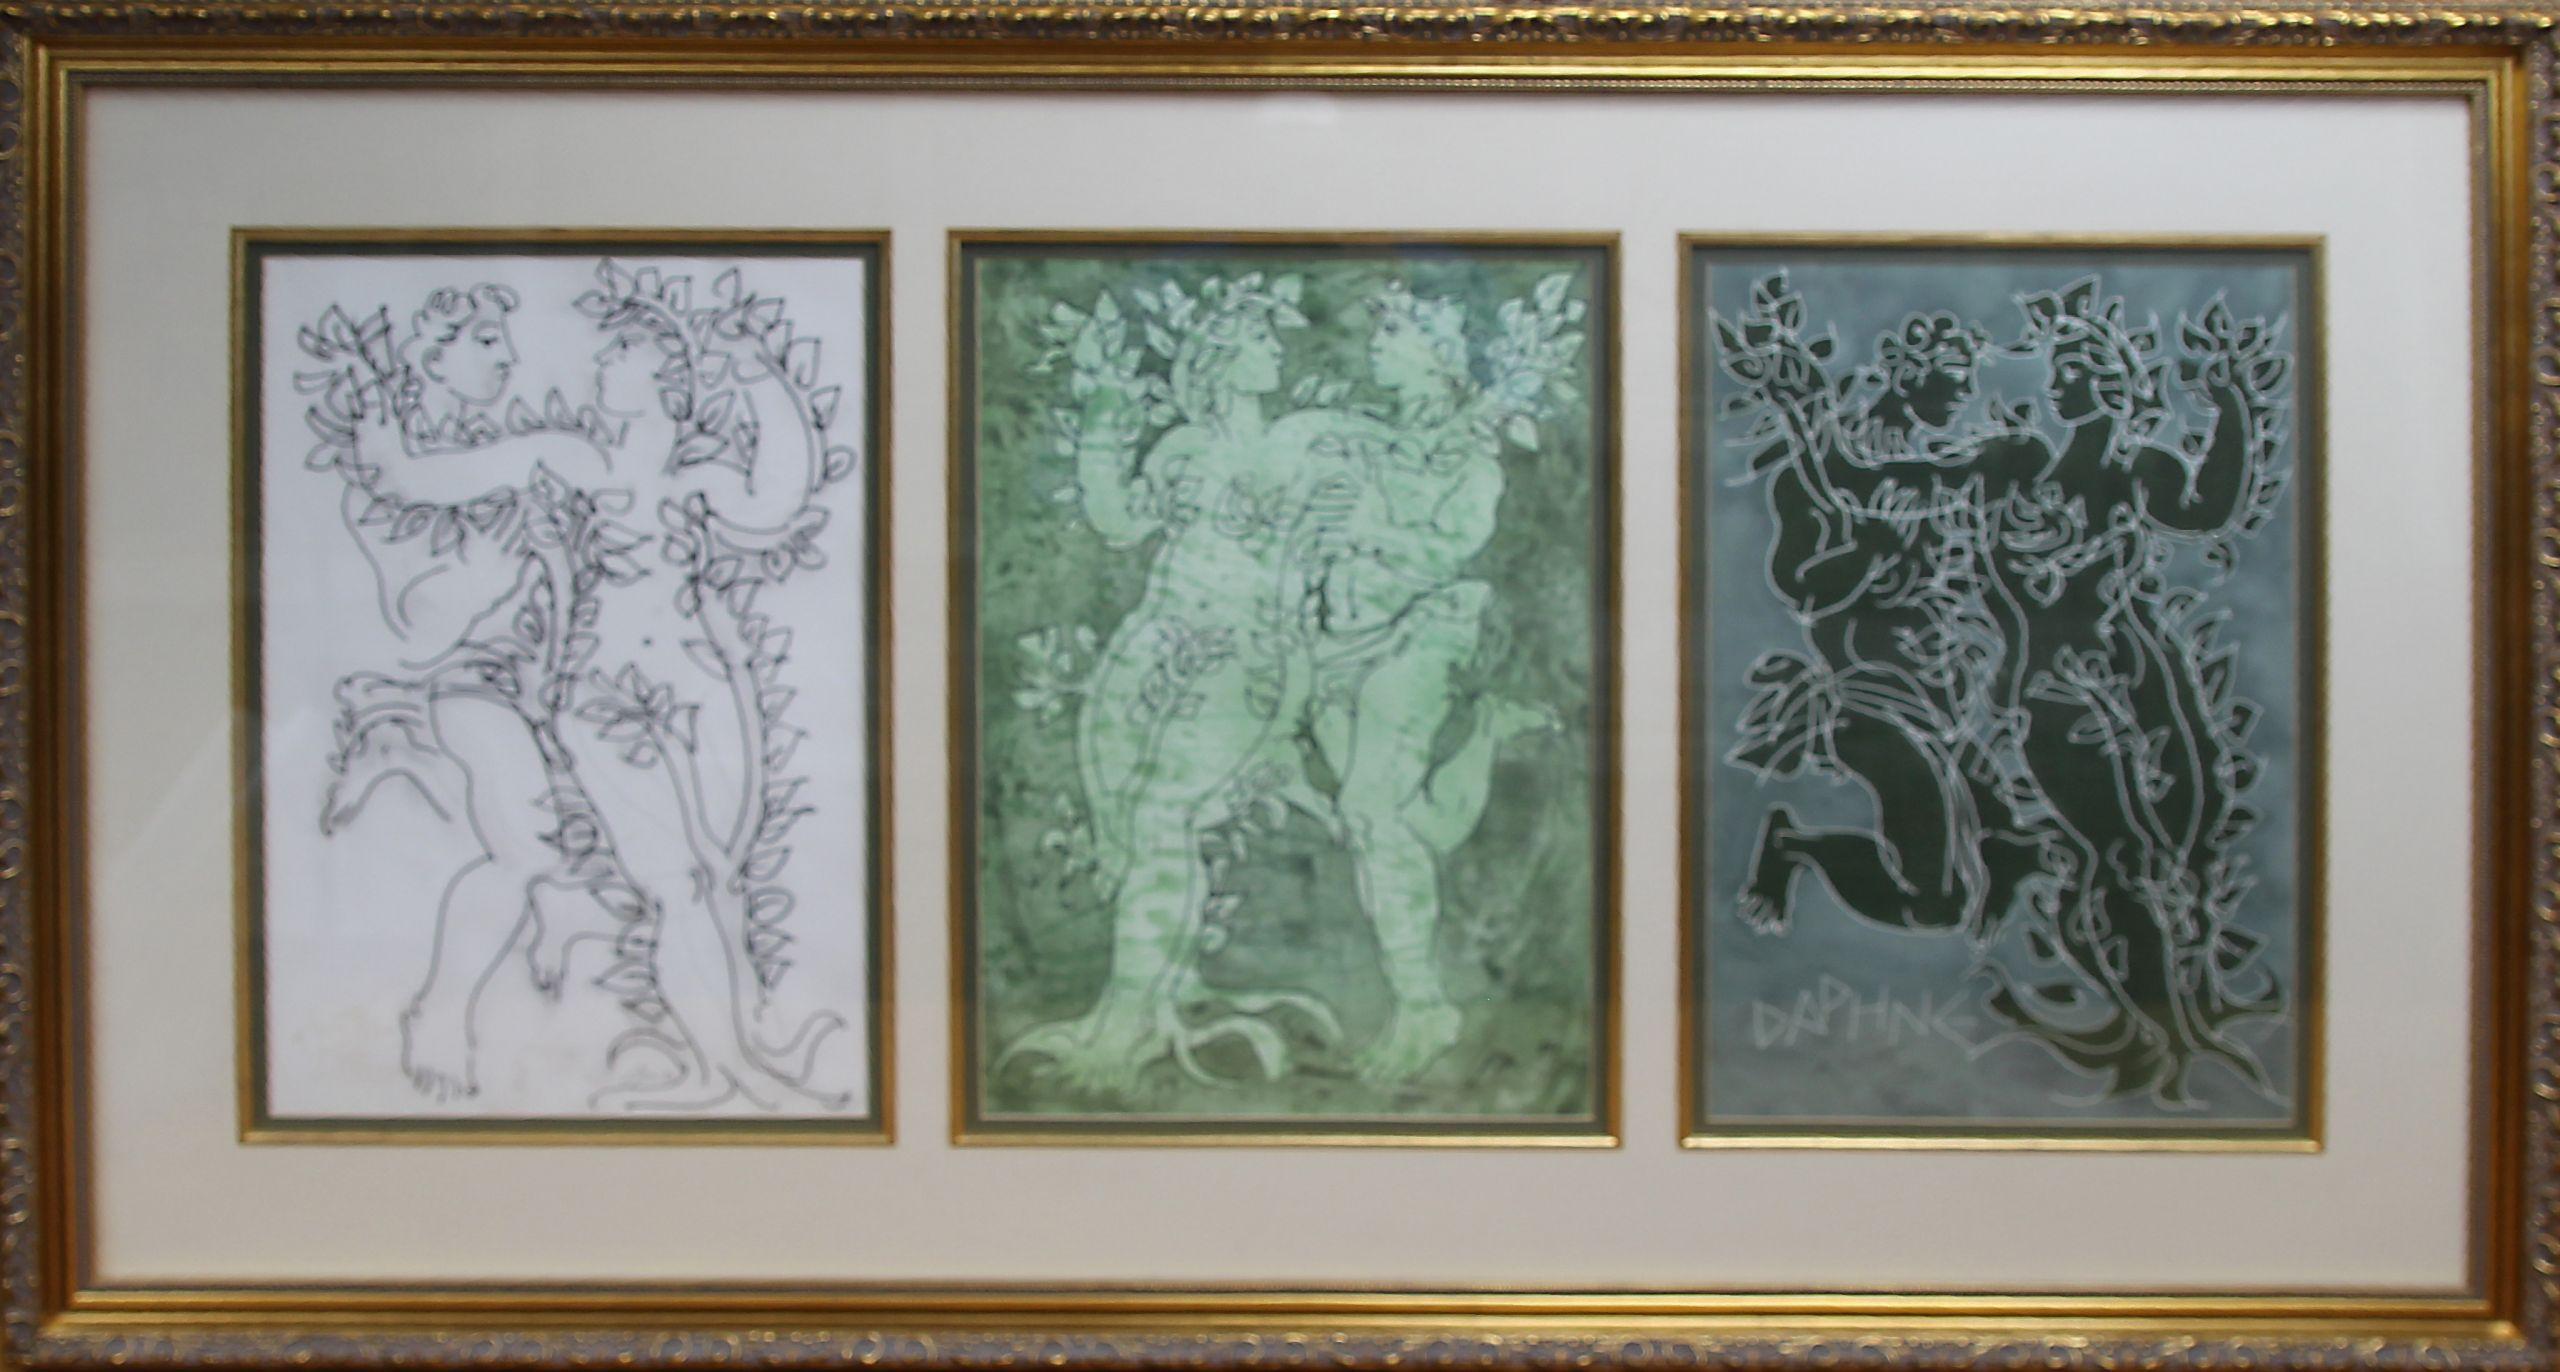 Daphne Series by Hans Erni